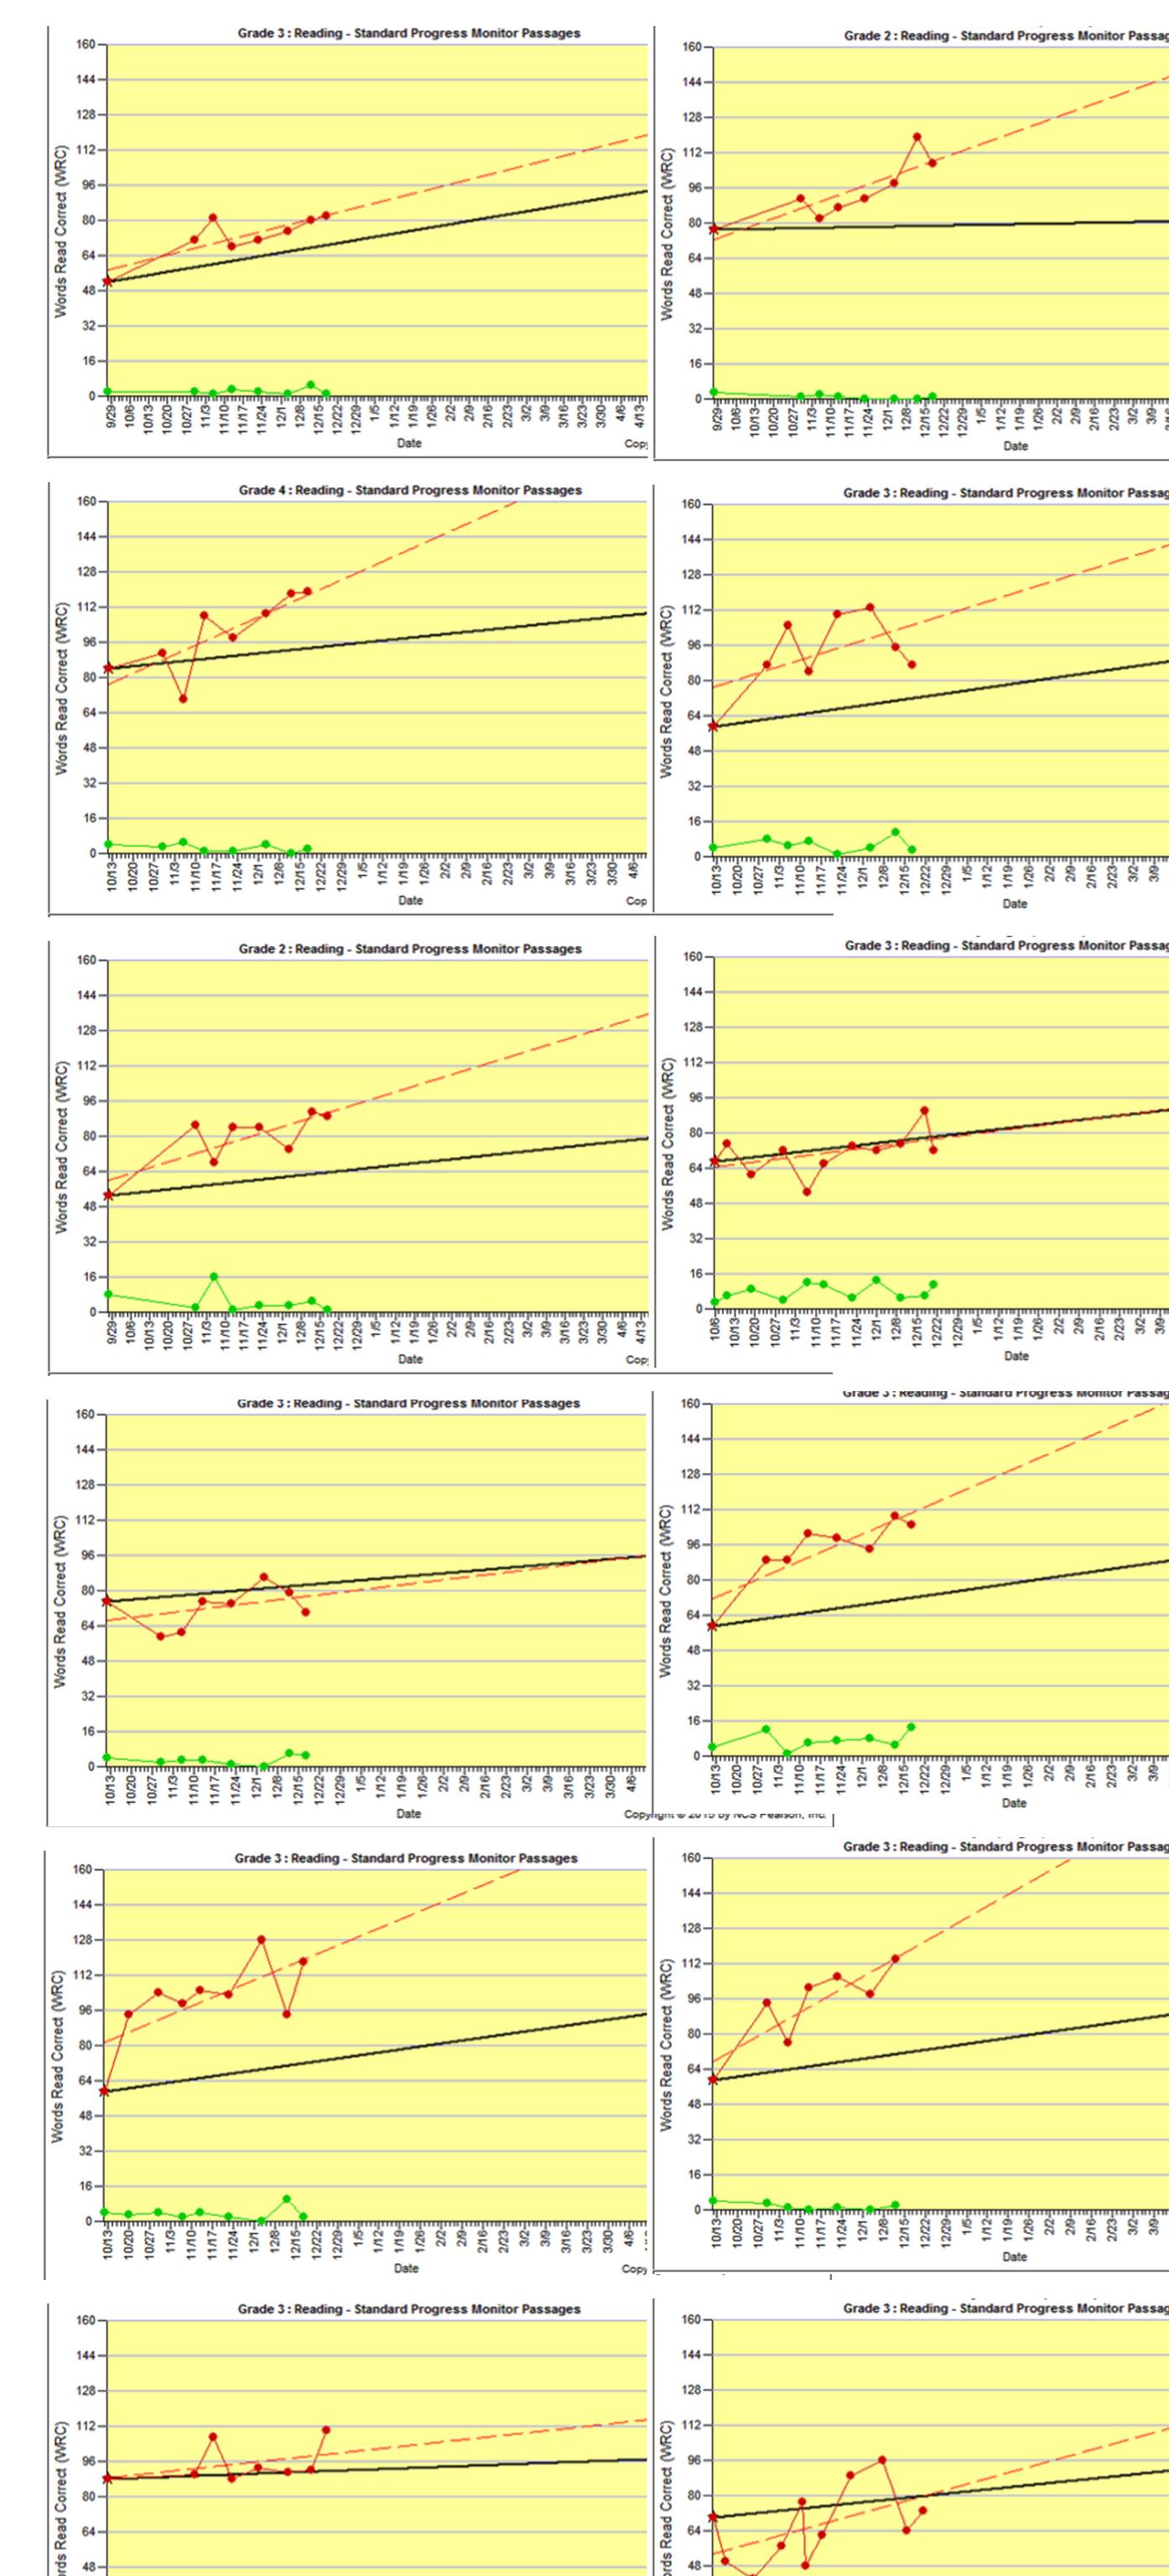 AIMSweb Graphs December 2014